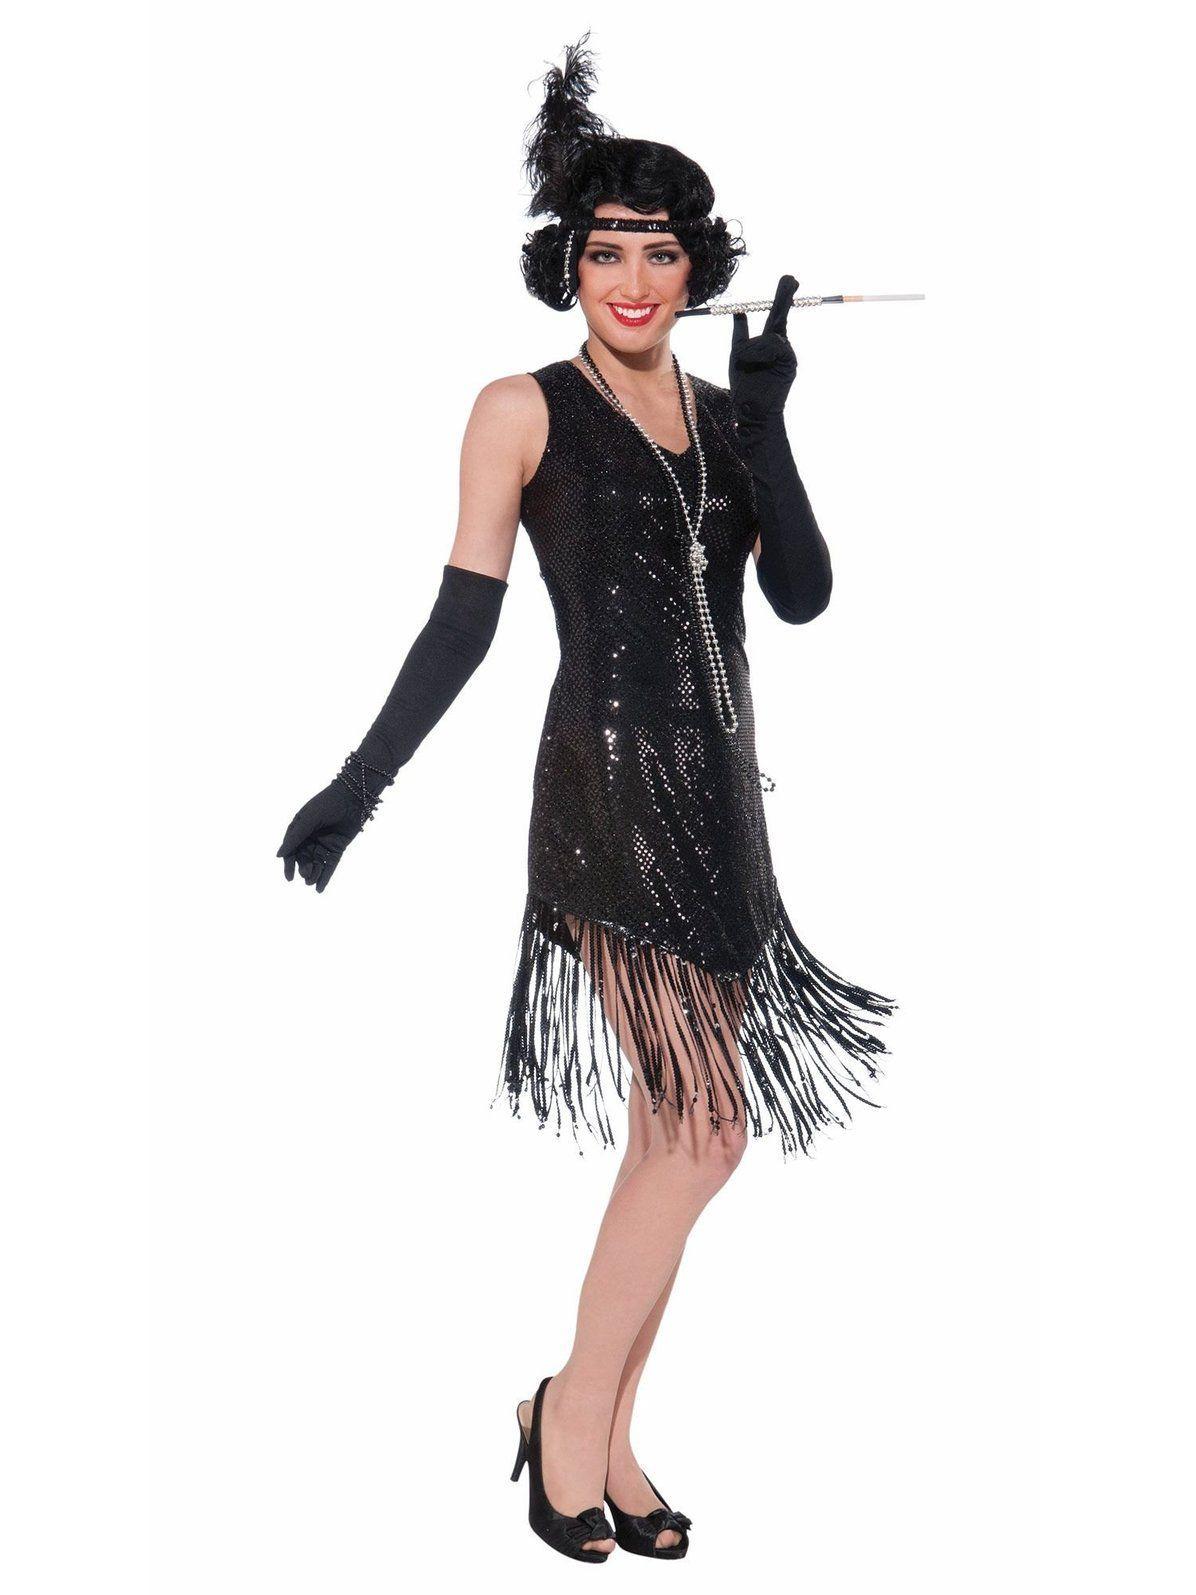 Womens Adult MULTI COLOR SEQUIN FLAPPER 1920s Costume Dress